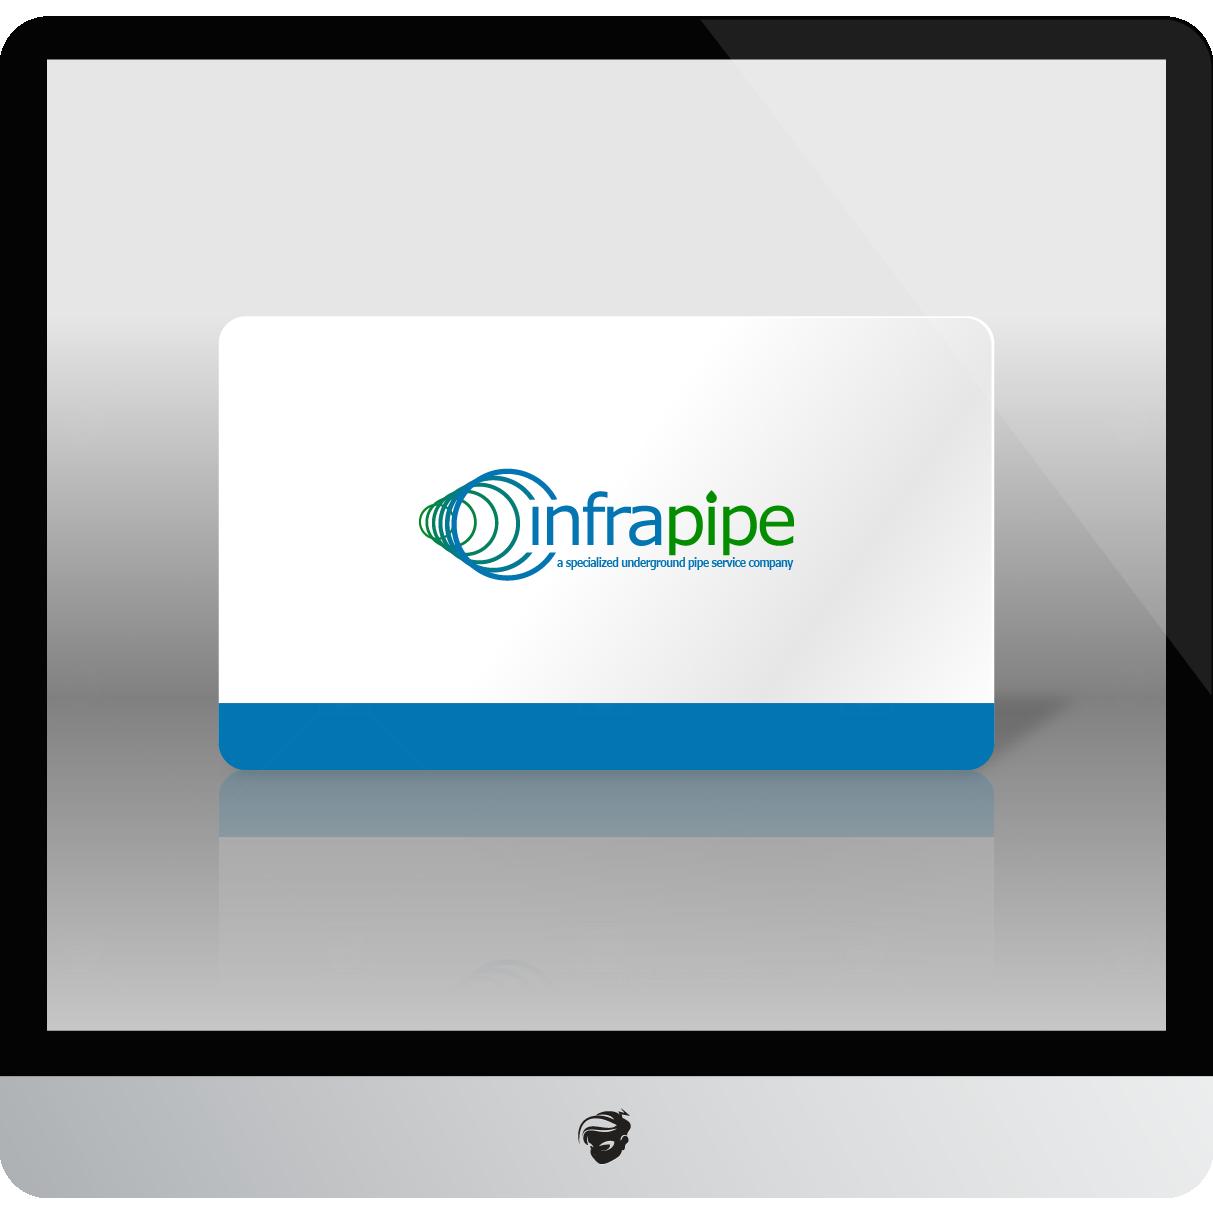 Logo Design by zesthar - Entry No. 175 in the Logo Design Contest Inspiring Logo Design for Infrapipe.